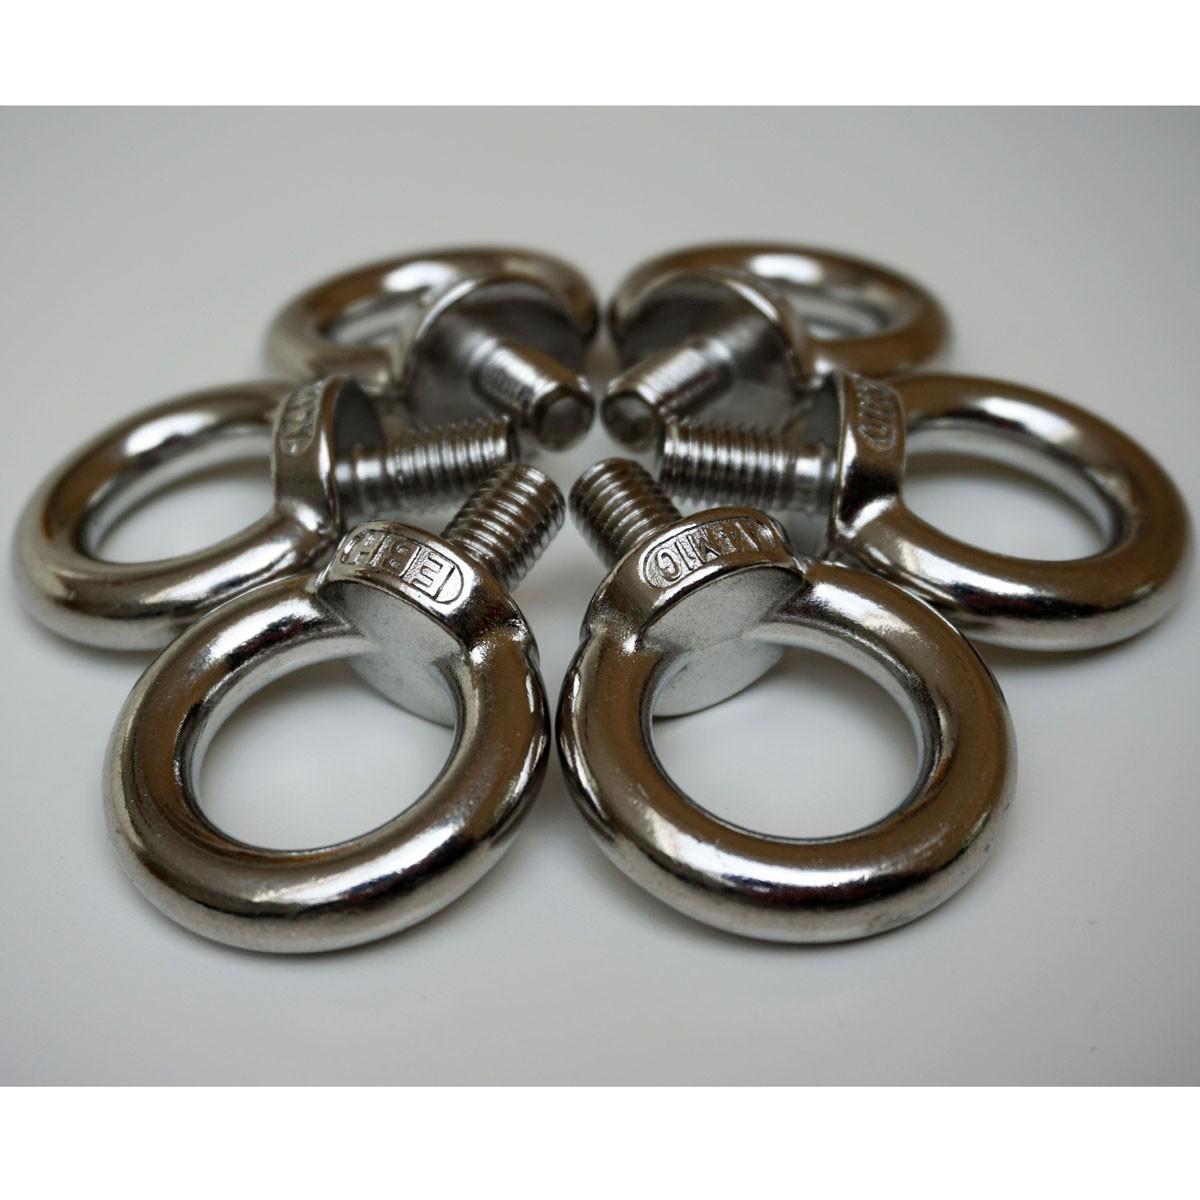 ringschraube din 580 edelstahl v2a ringbolzen a2 va metrisch m6 m8 m10 m12. Black Bedroom Furniture Sets. Home Design Ideas